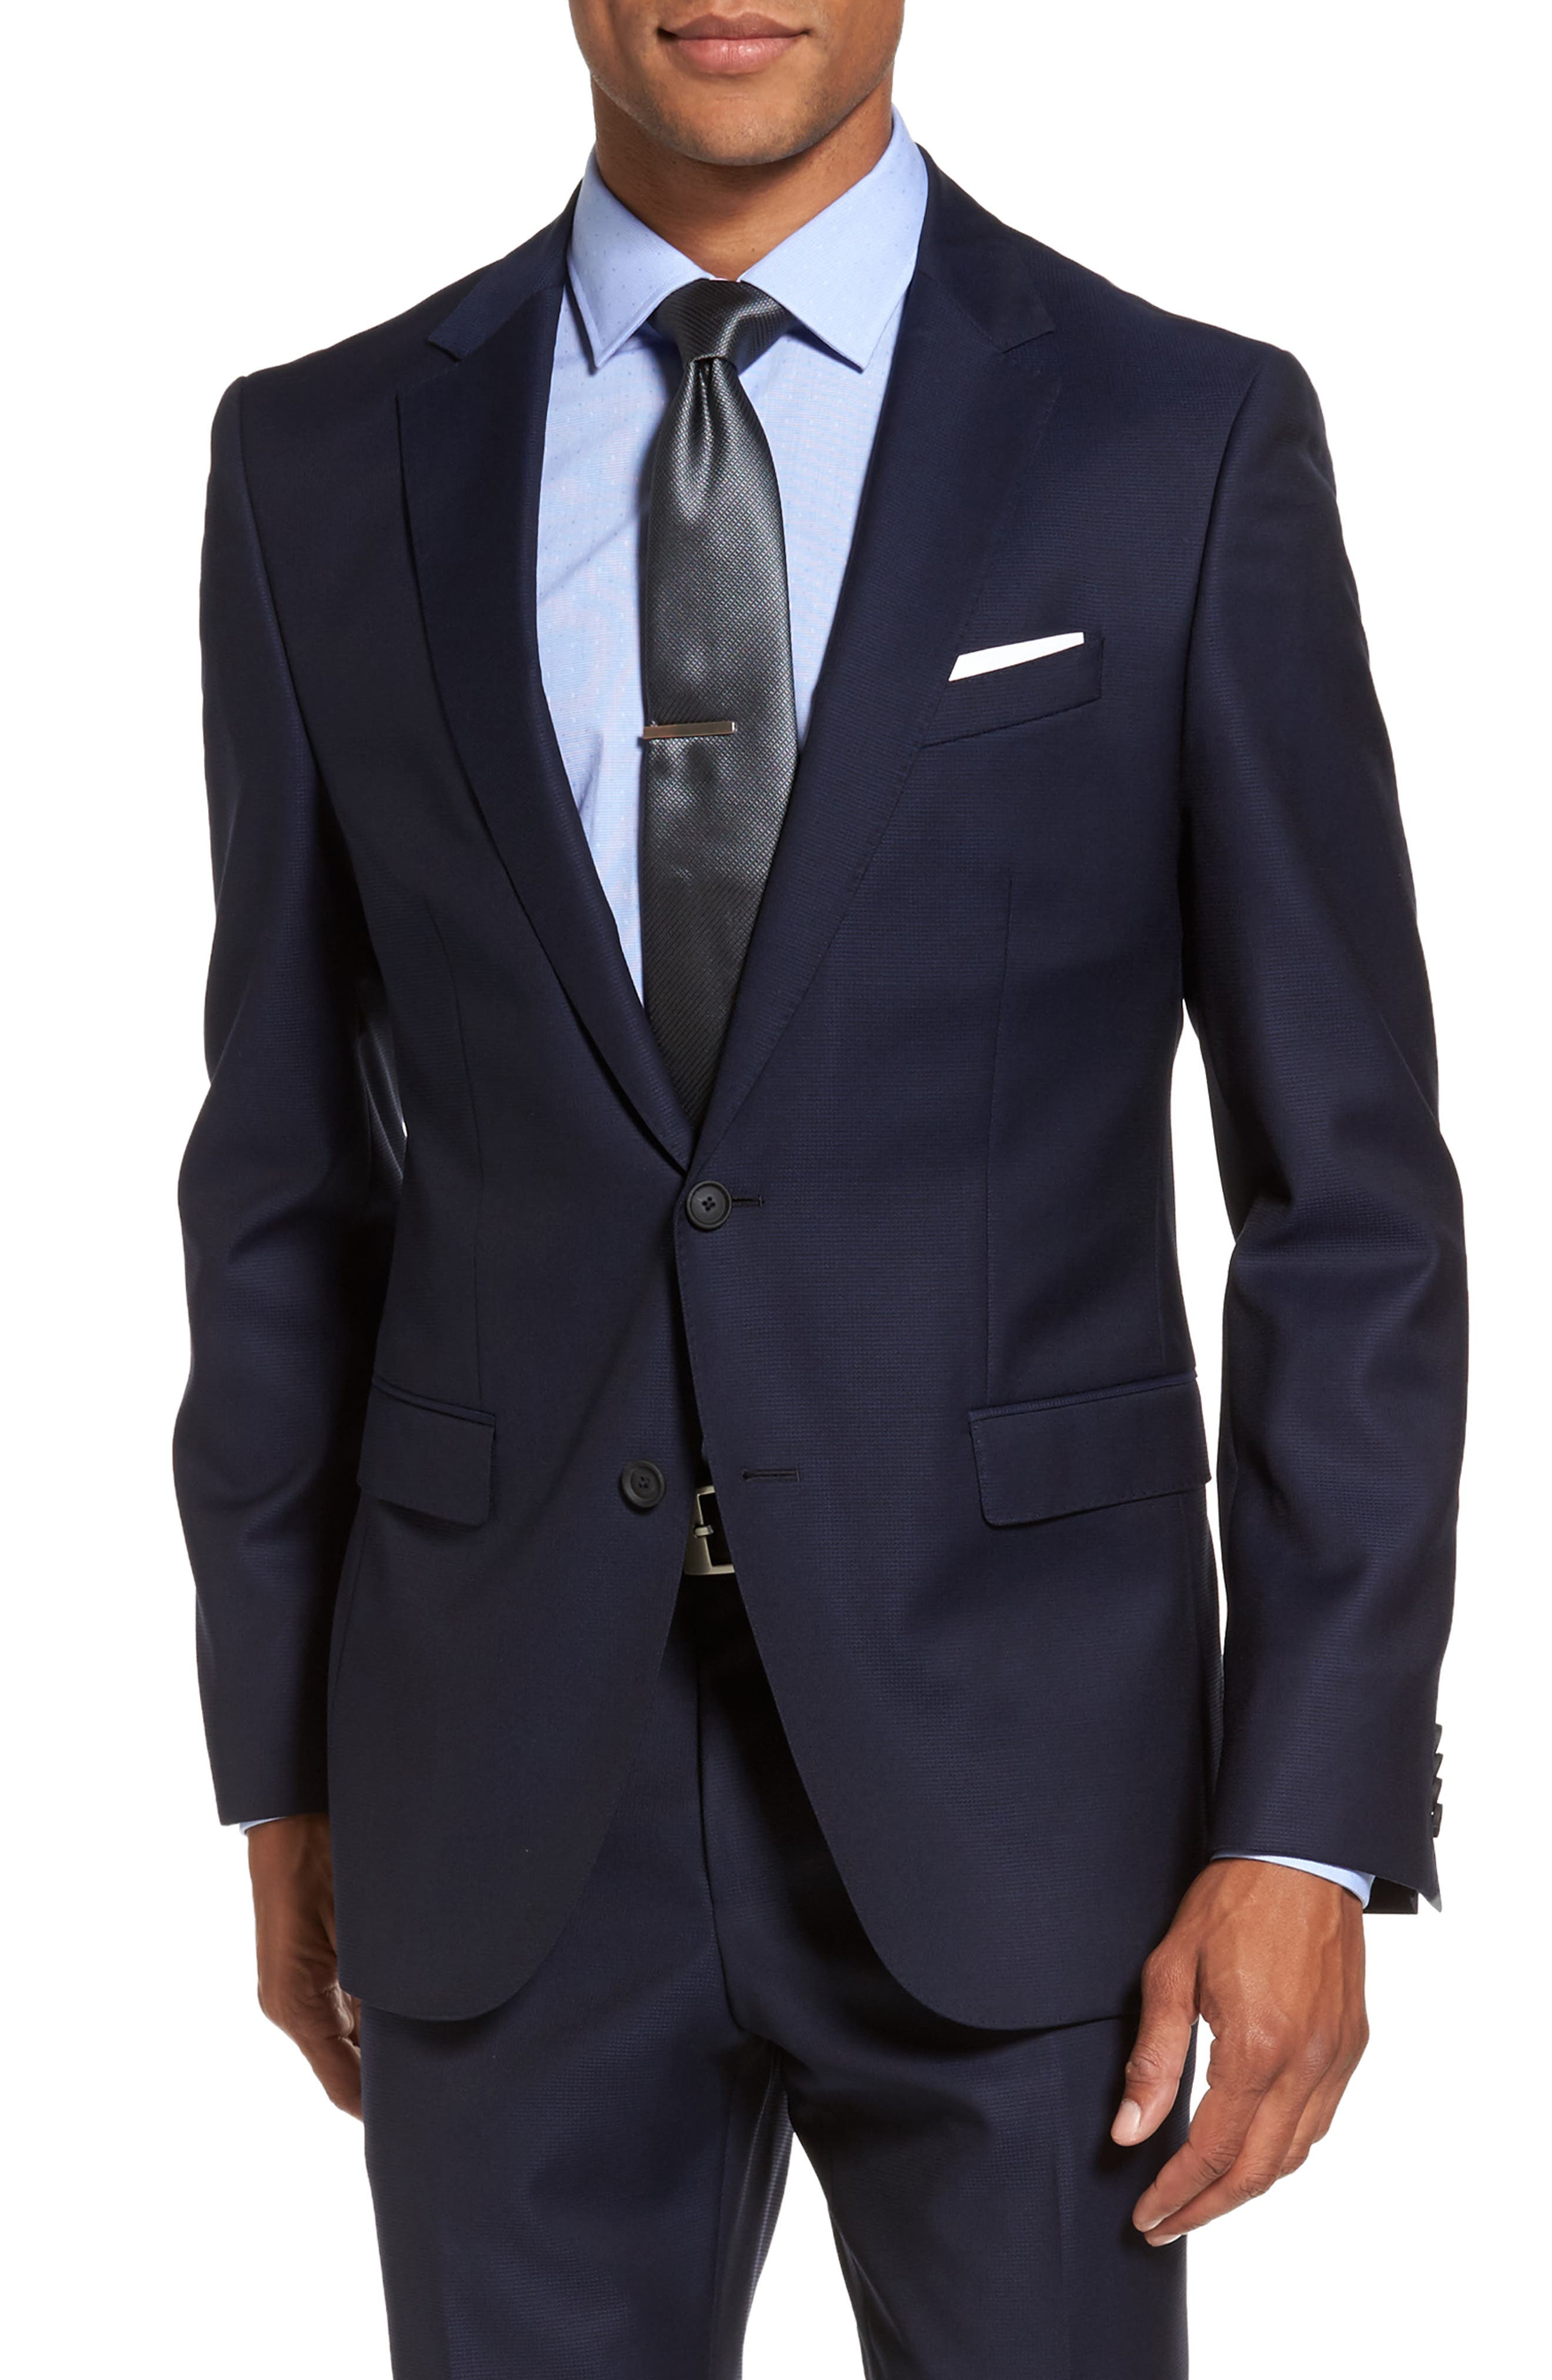 Nestro/Byte Trim Fit Solid Wool Suit,                             Alternate thumbnail 5, color,                             410